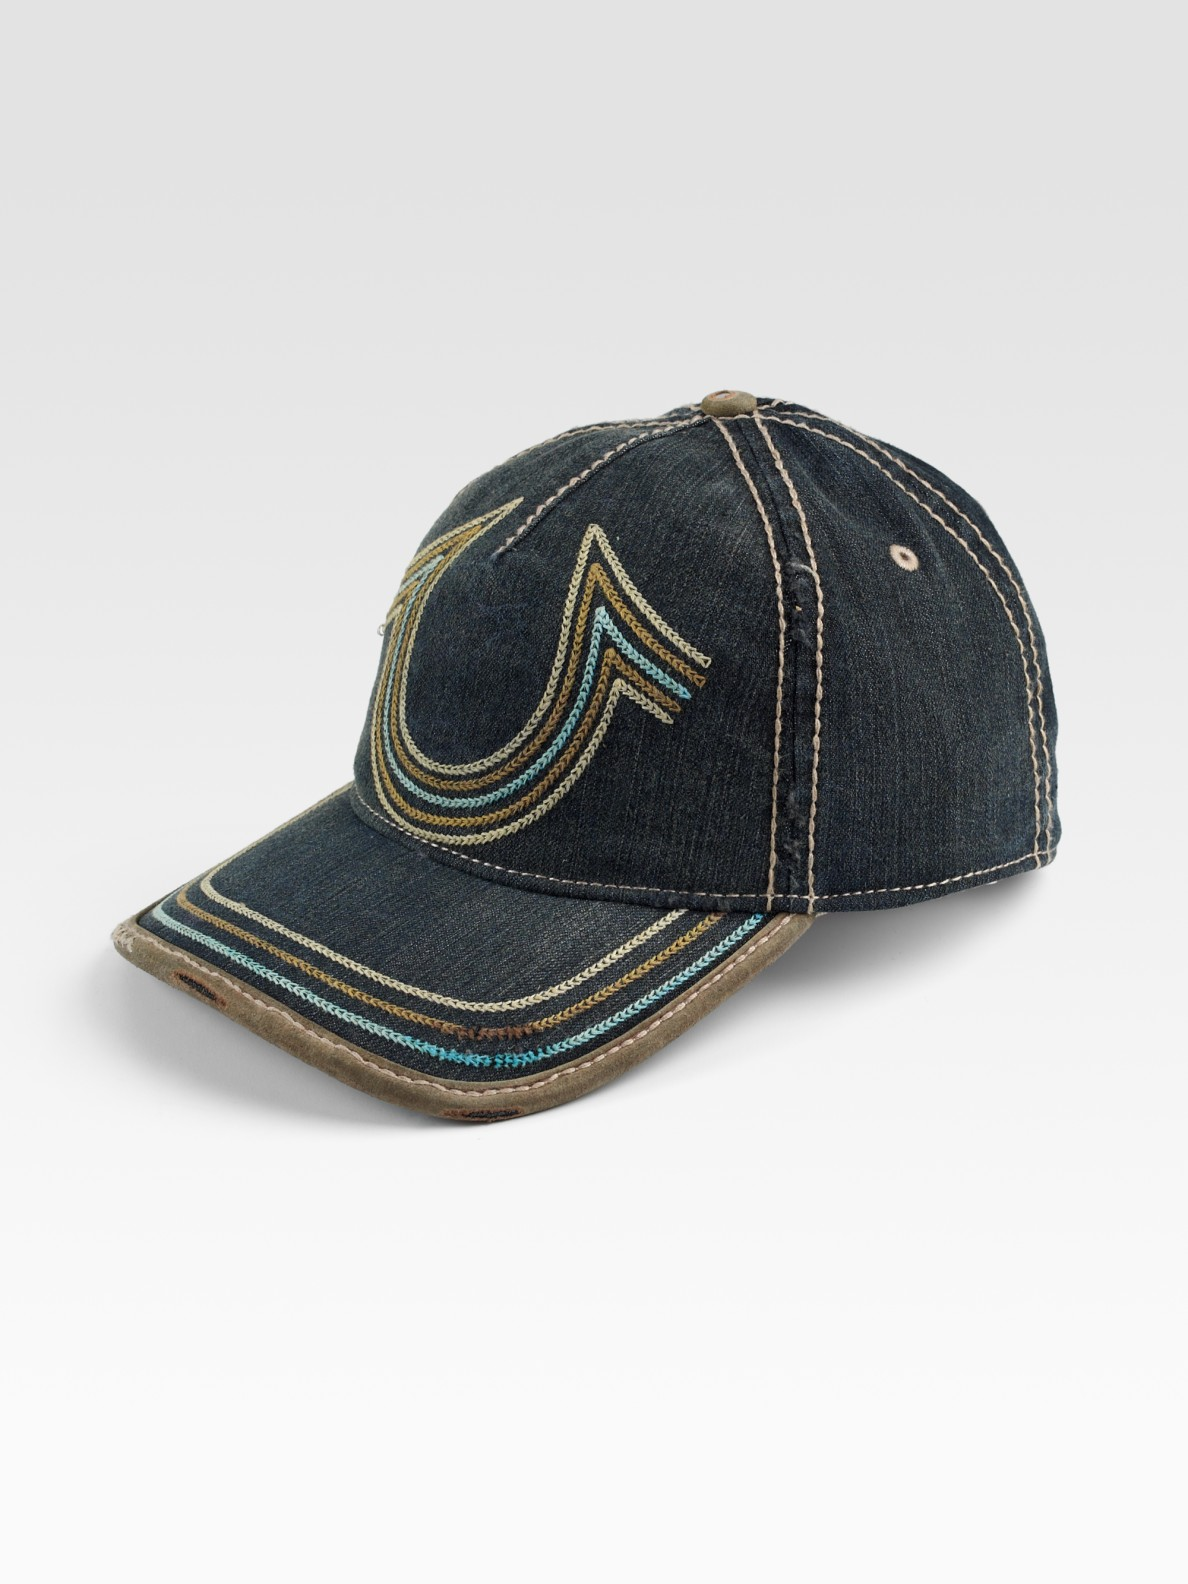 true religion horseshoe stitch baseball cap in gray for men black lyst. Black Bedroom Furniture Sets. Home Design Ideas